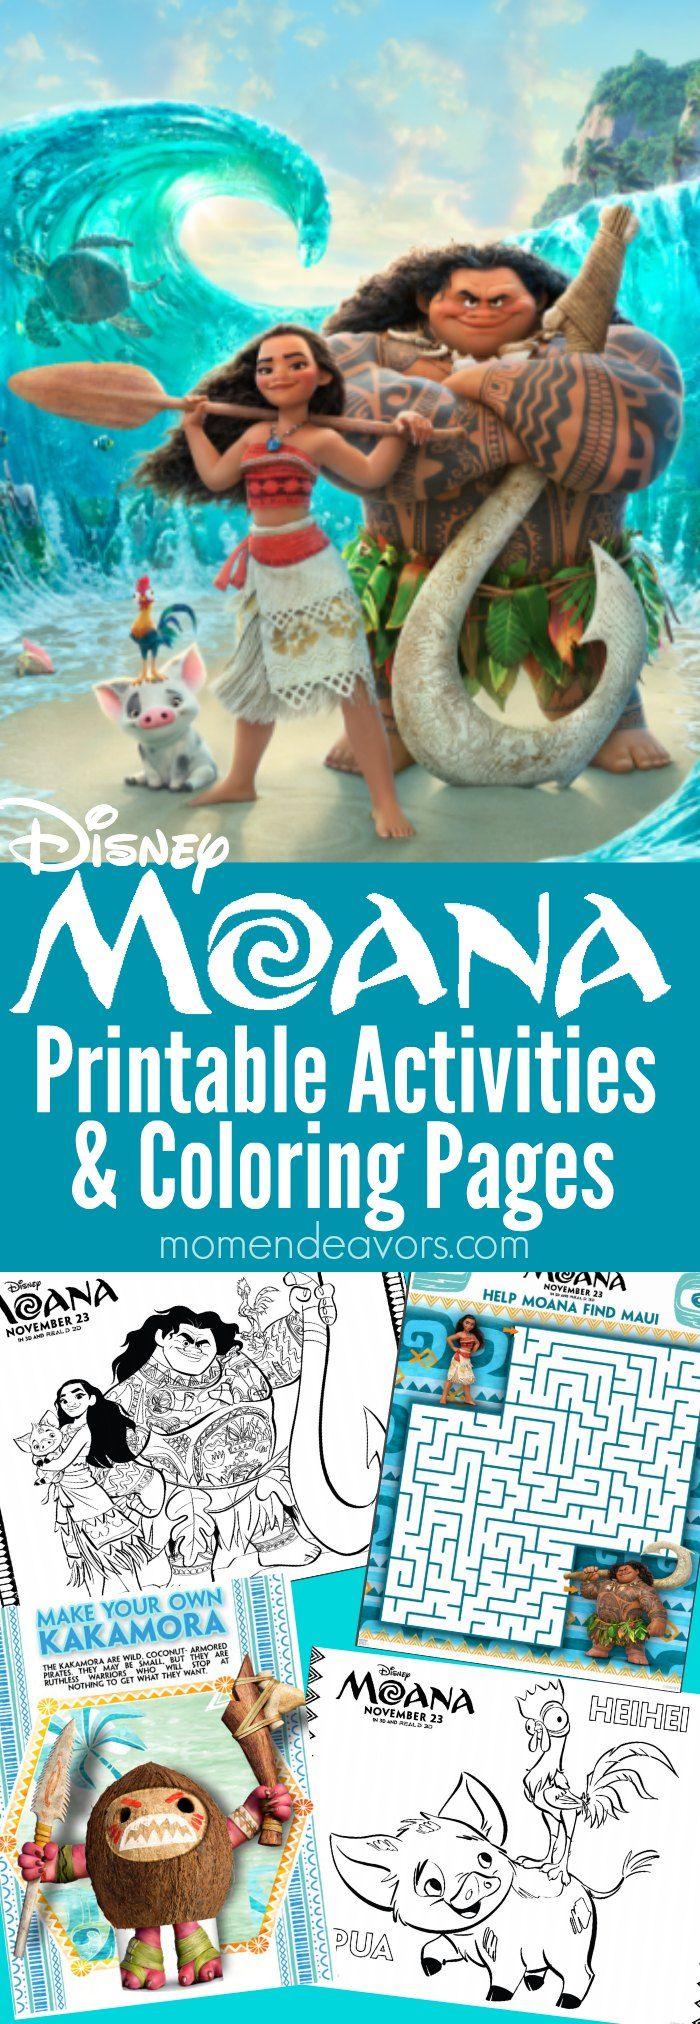 Disney MOANA Printable Activities